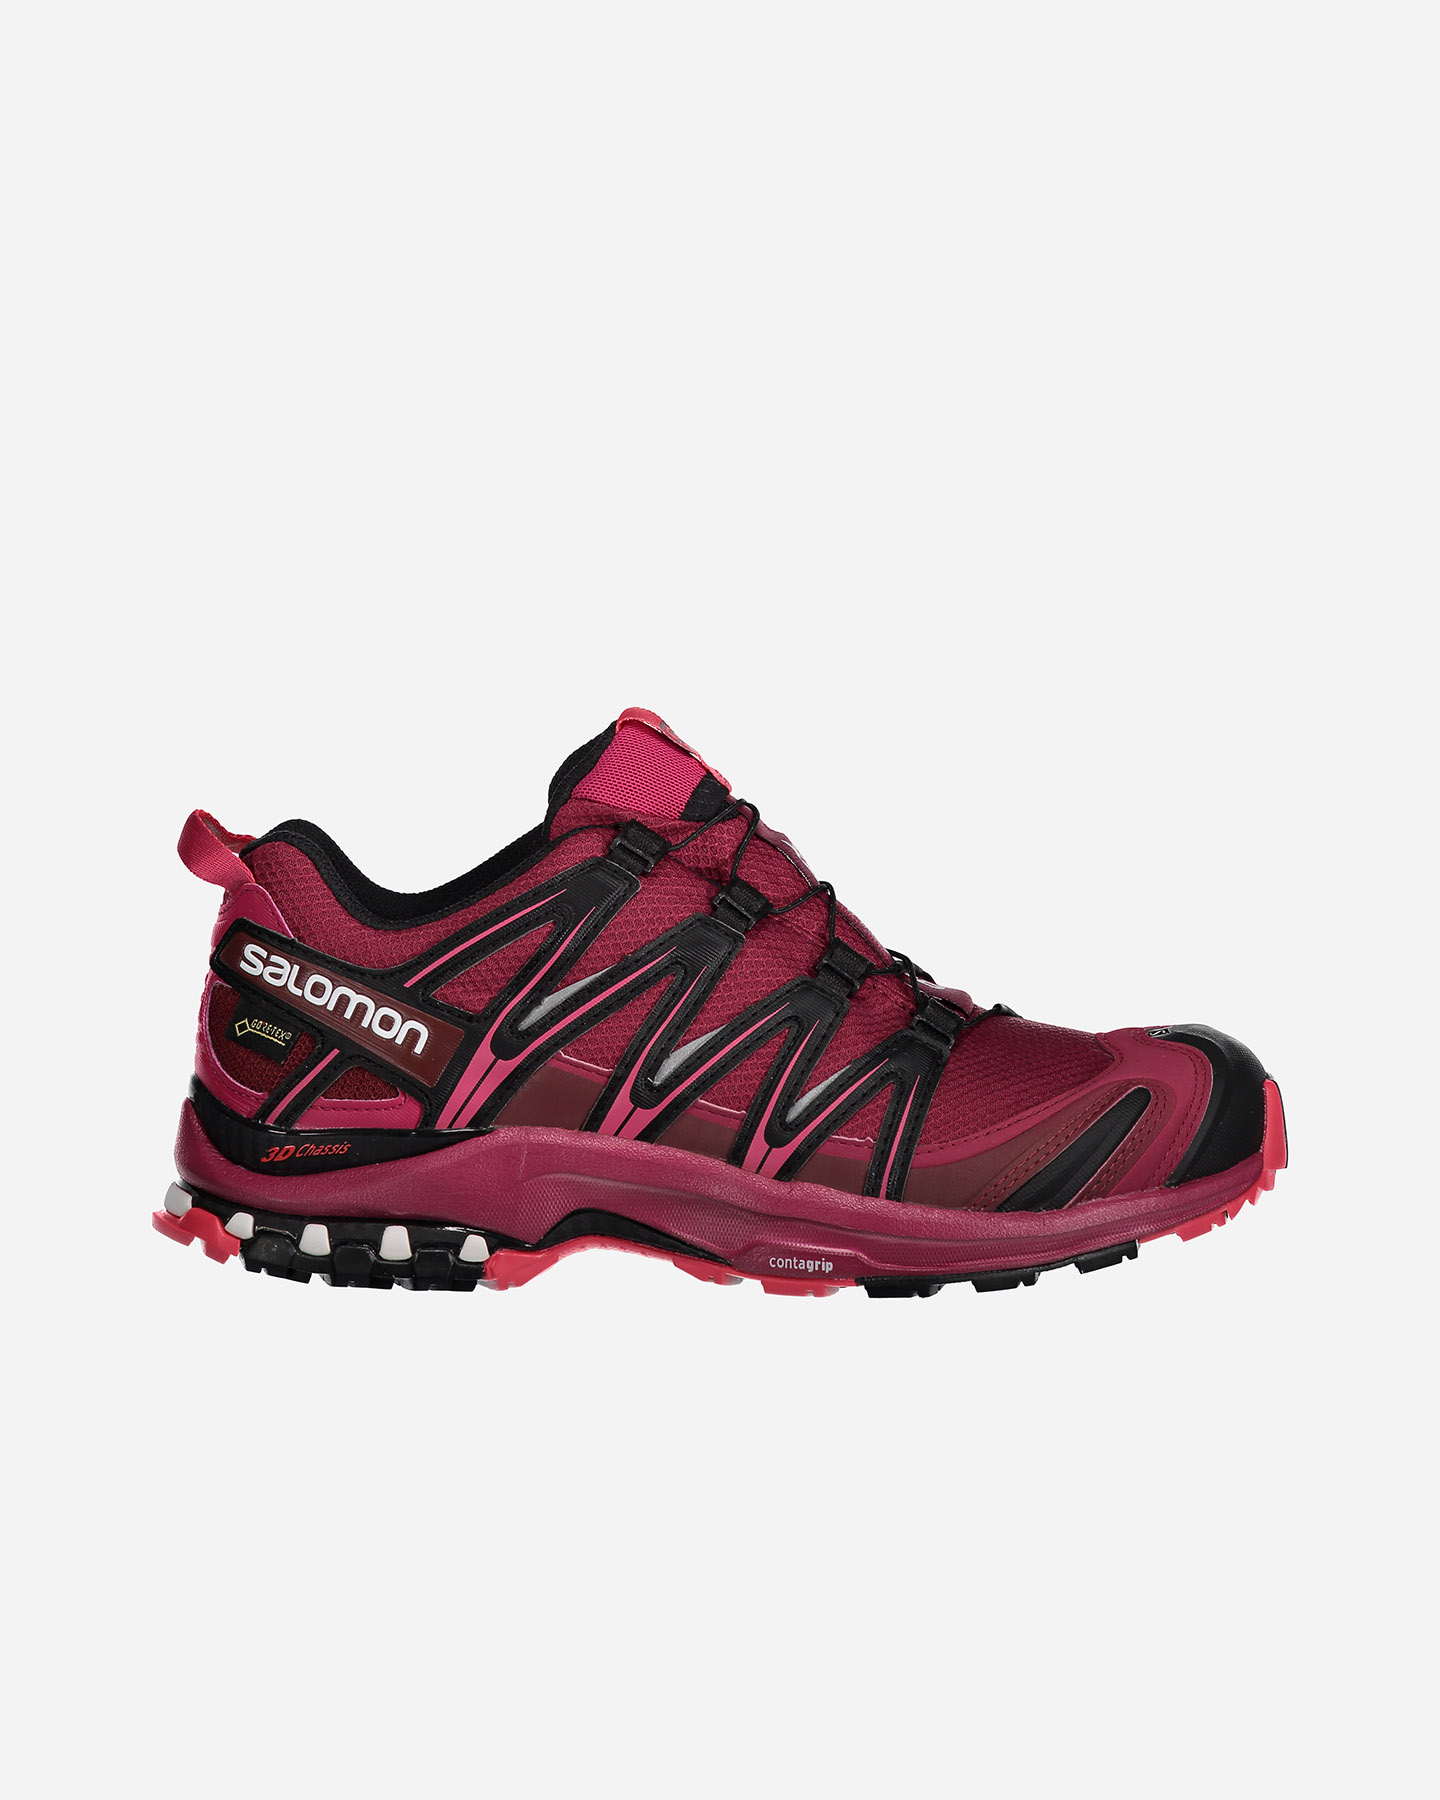 XA PRO 3D GORE TEX® SALOMON, scarpe running per maxi sport